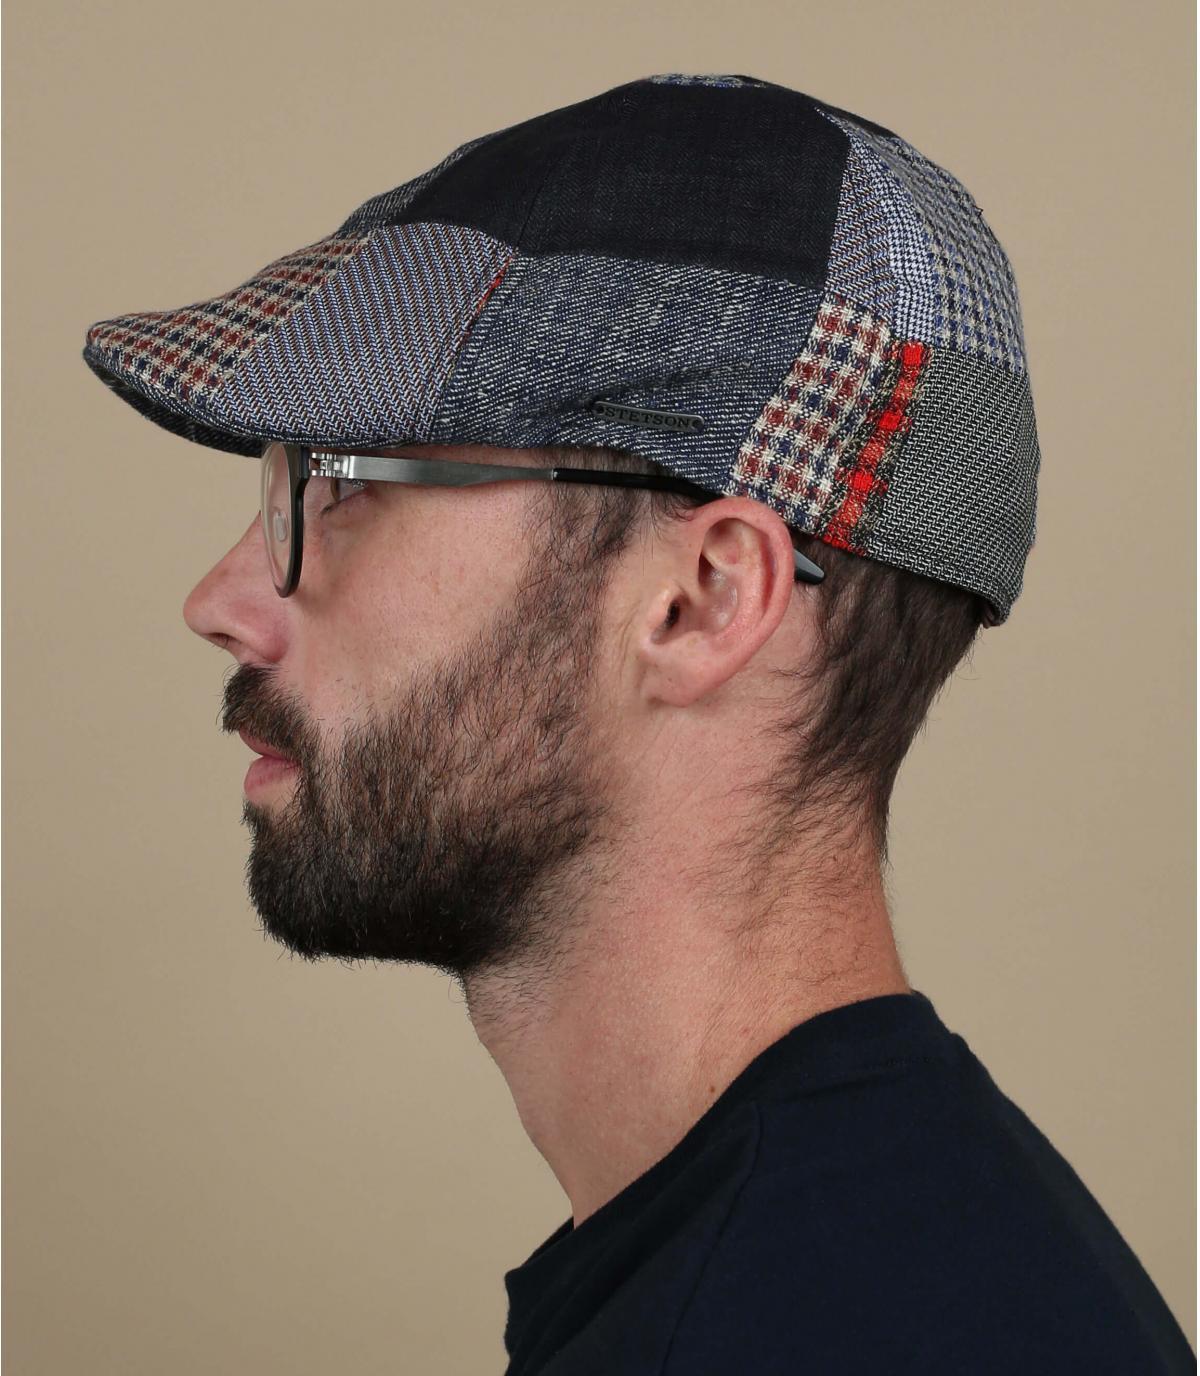 patchwork di becco d'oca berretto